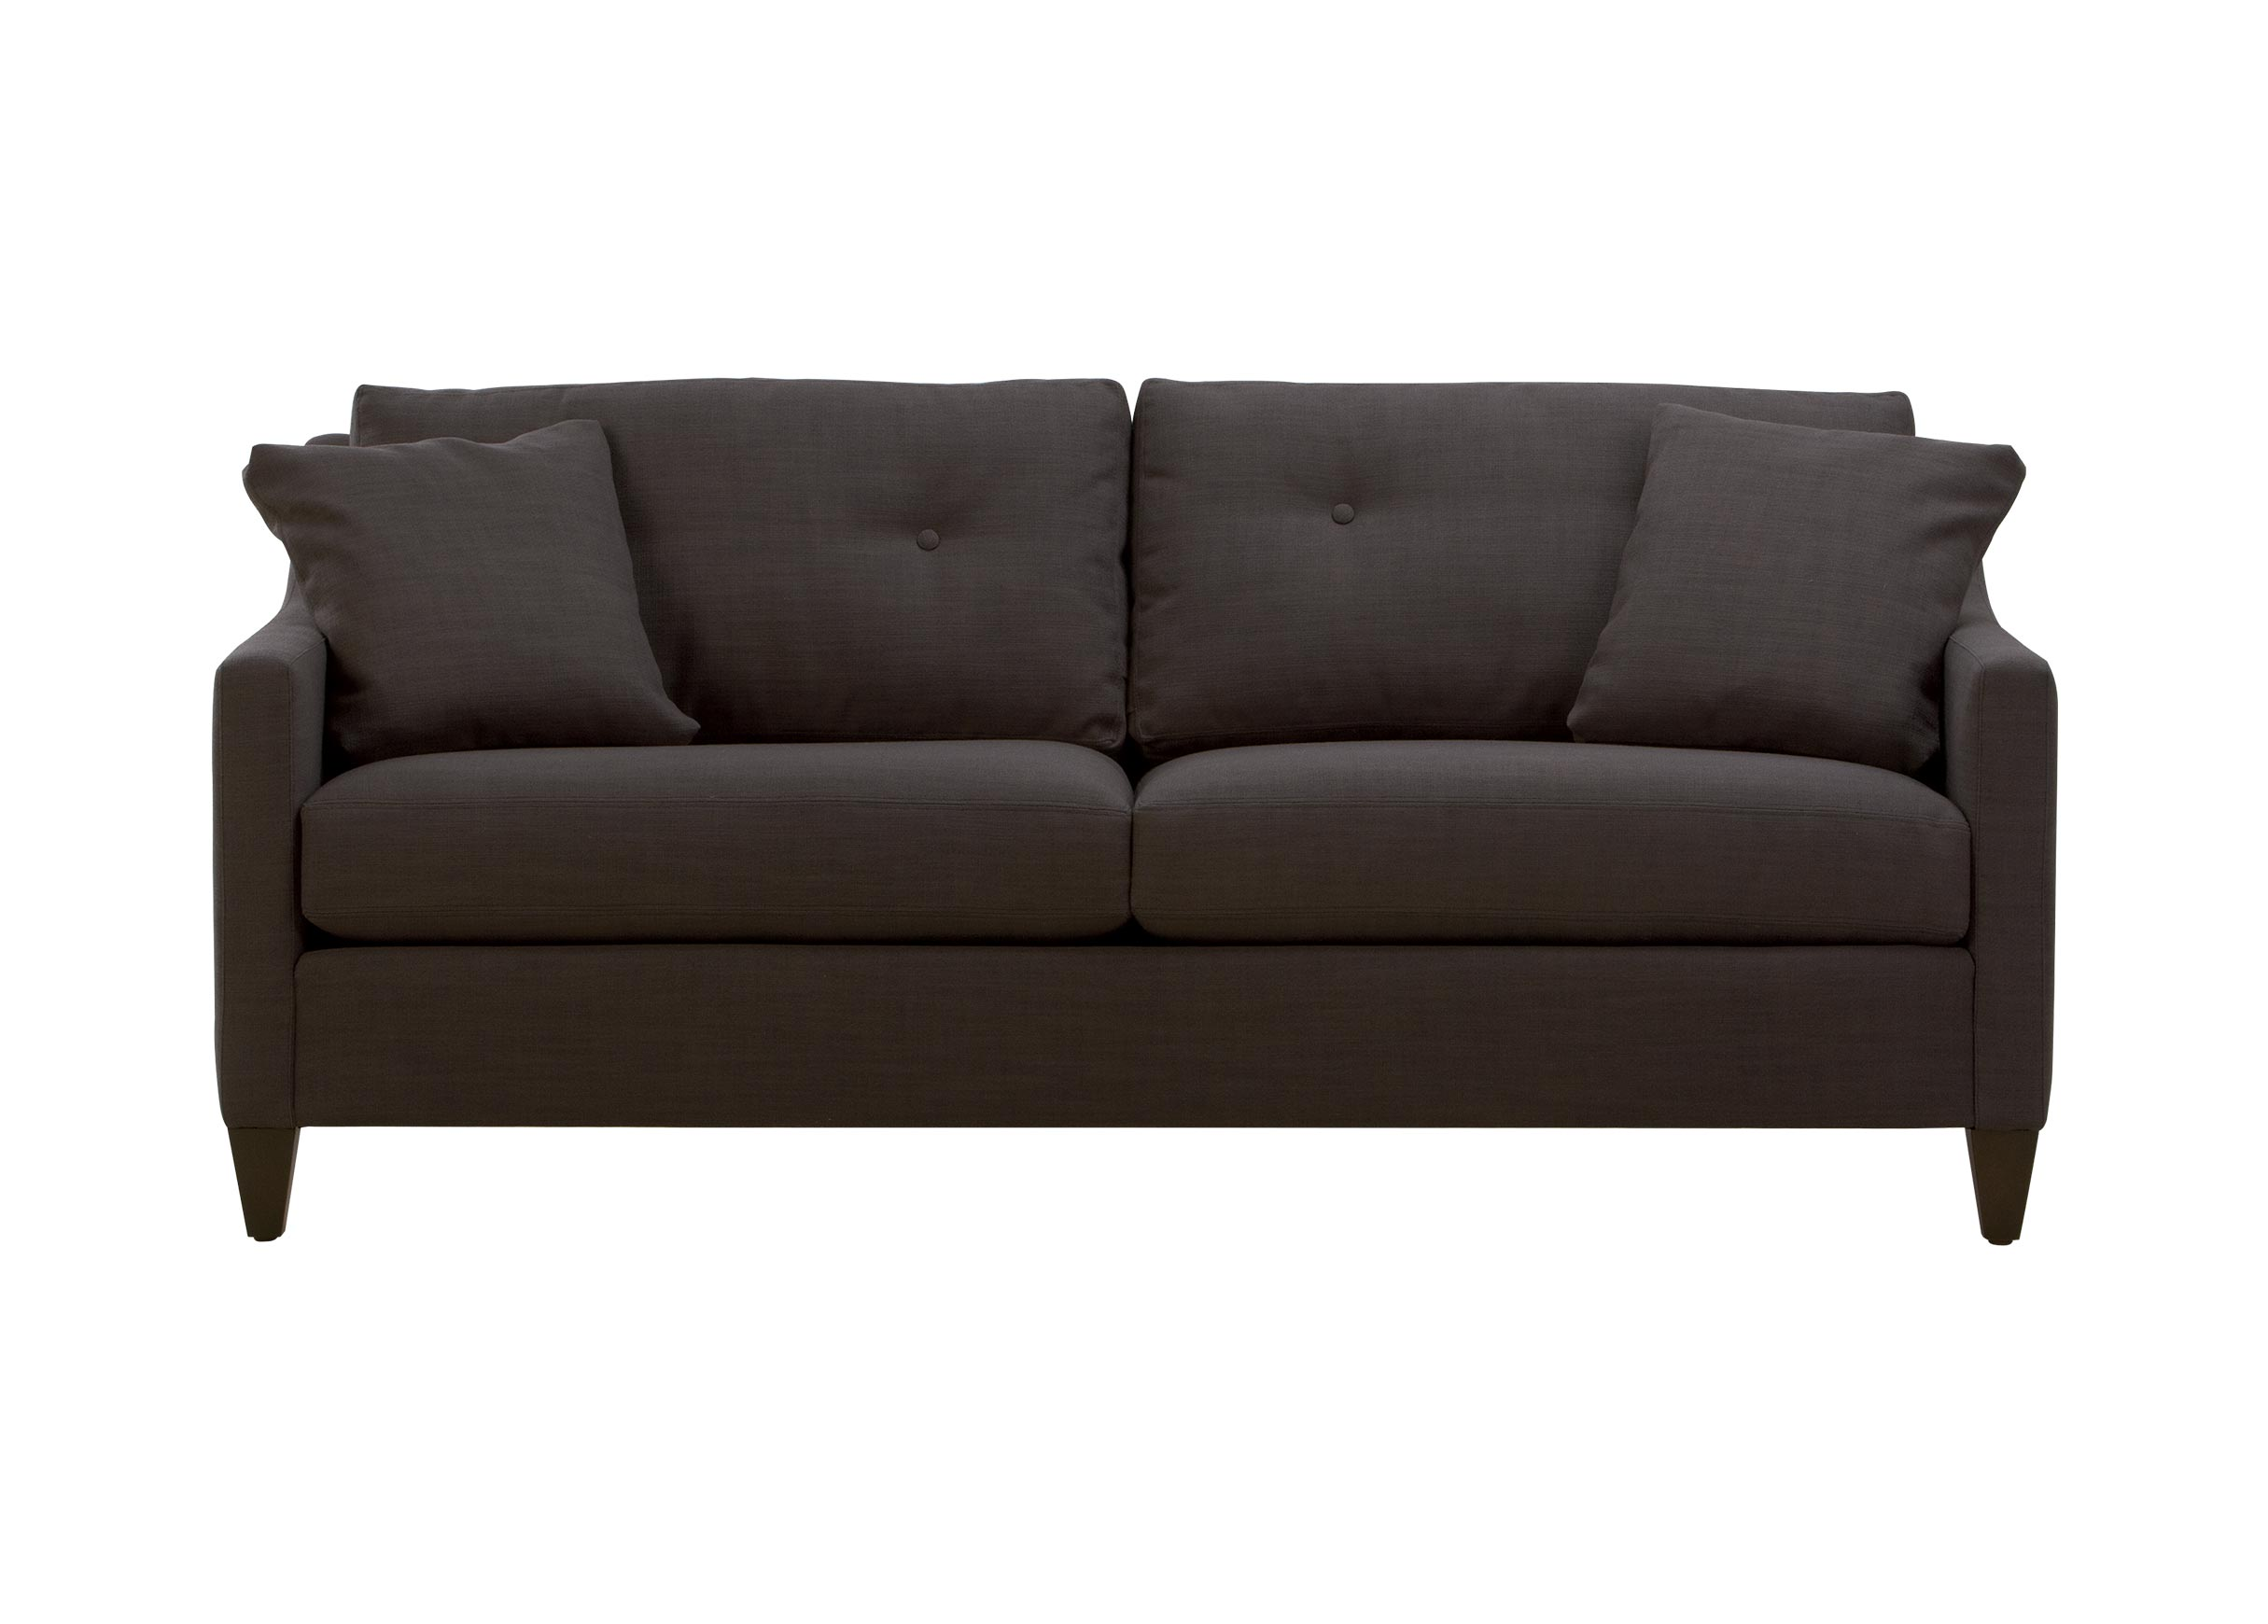 images monterey sofa   largegray. monterey sofa  sofas  loveseats  sitegenesis